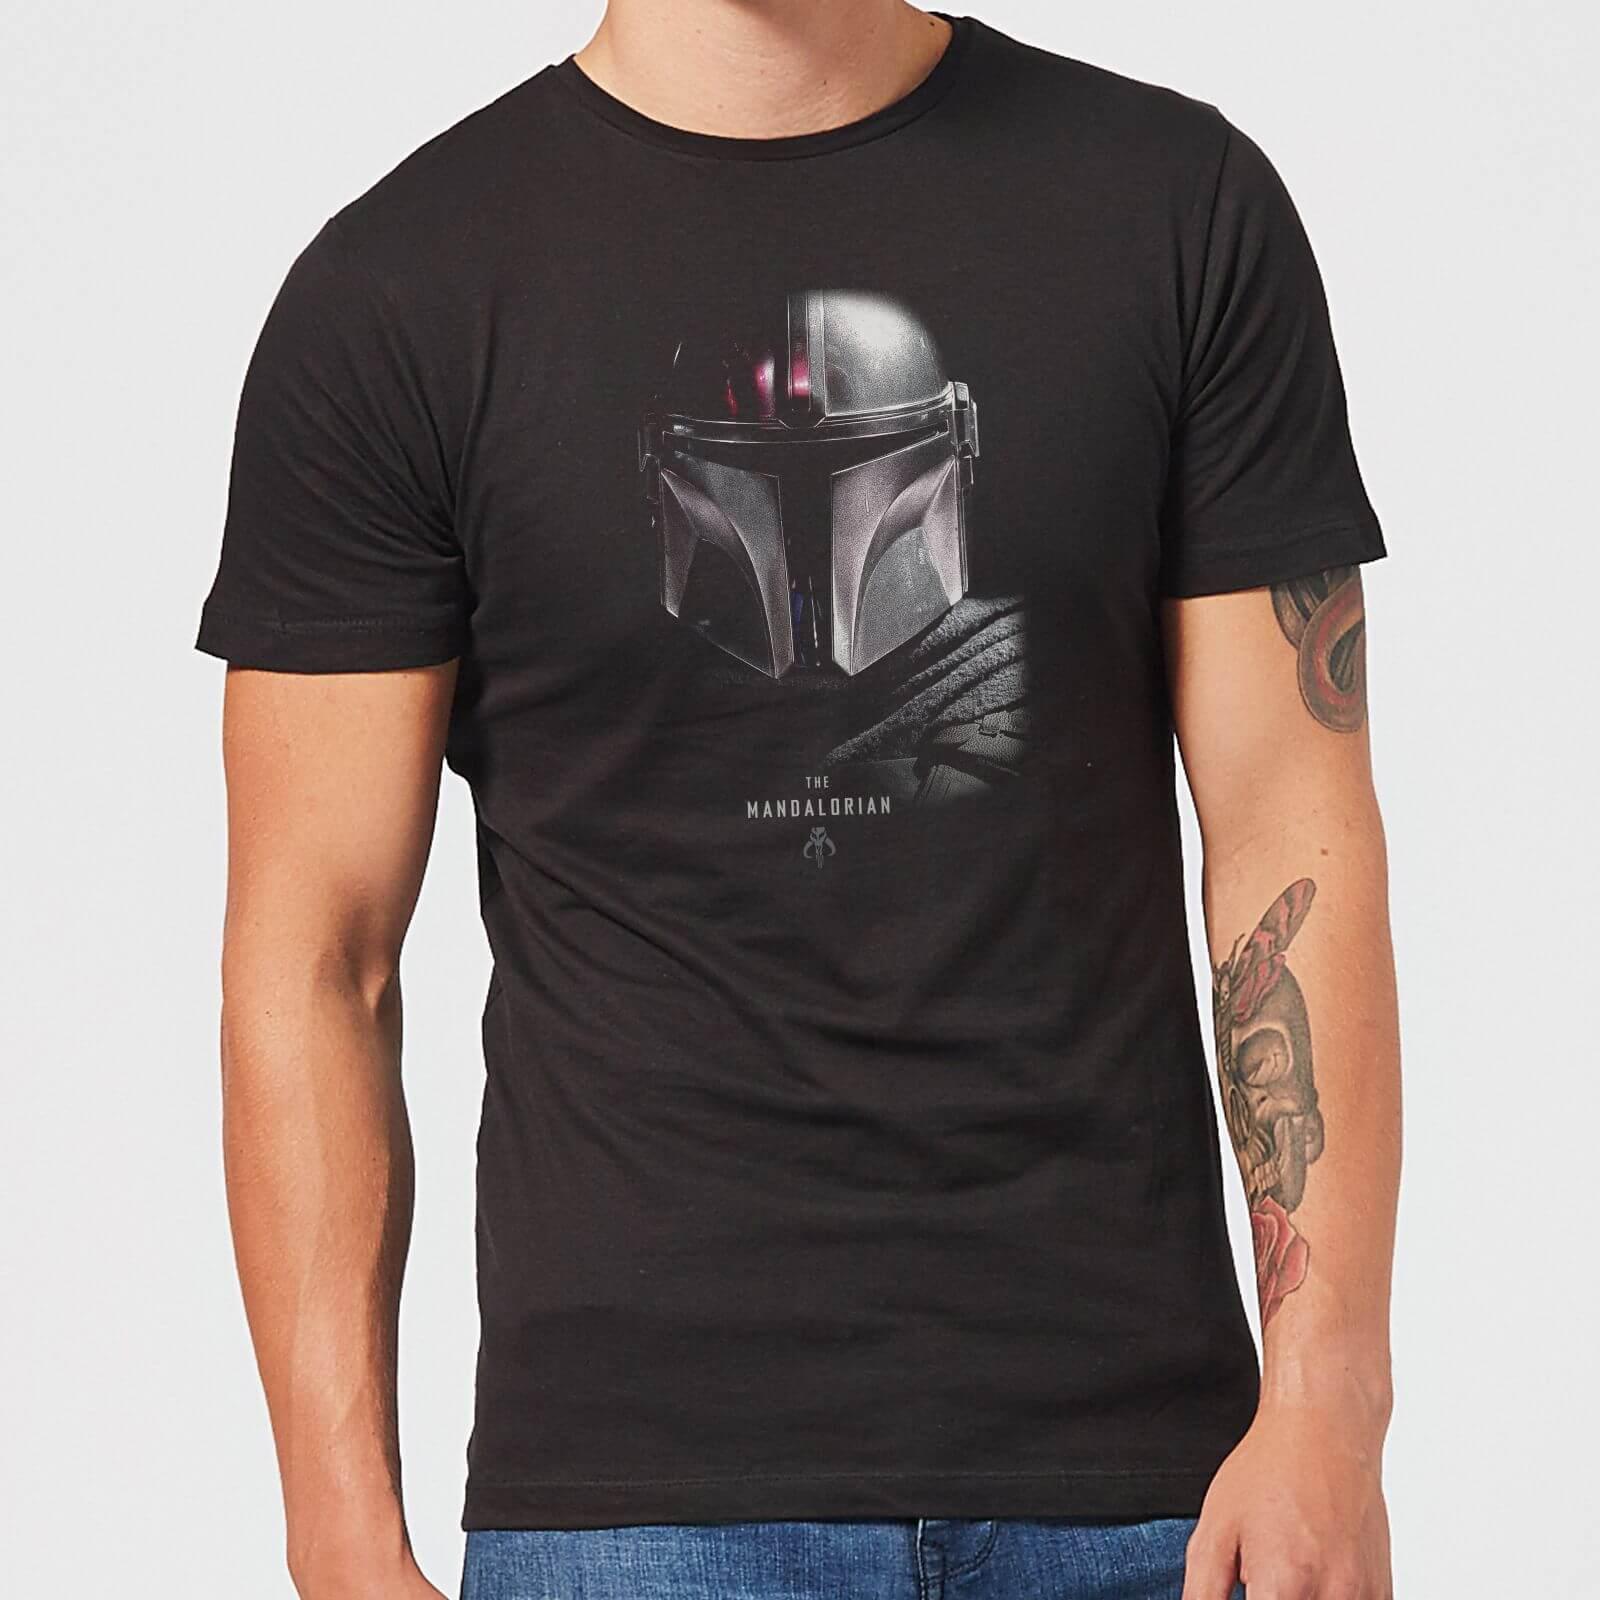 Camiseta Mandalorian Stars Wars